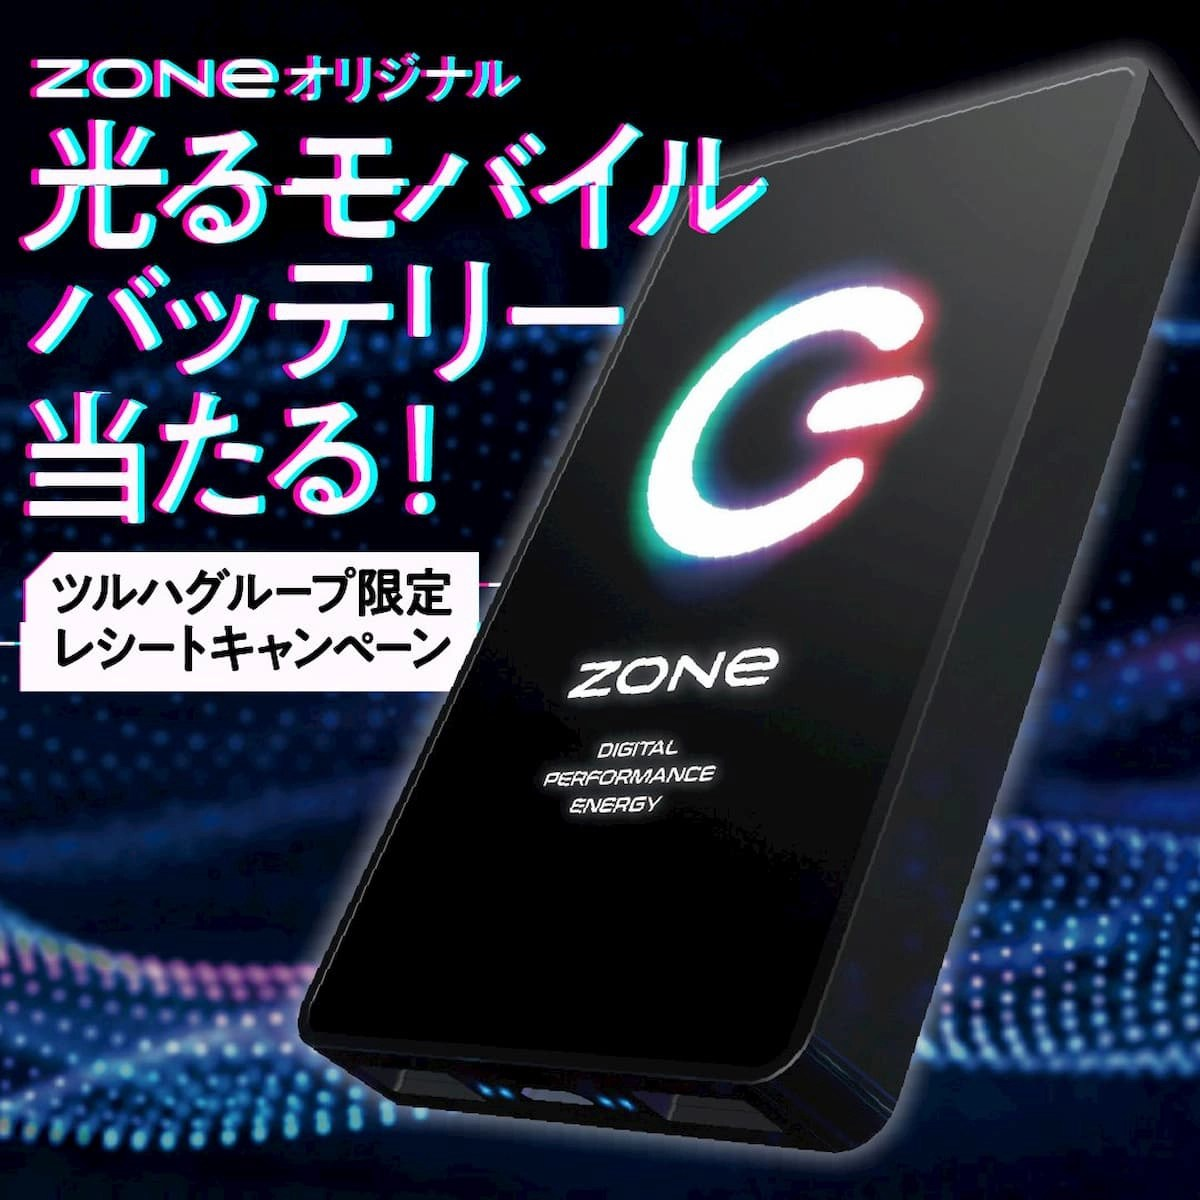 ZONeオリジナル光るモバイルバッテリー当たるキャンペーン